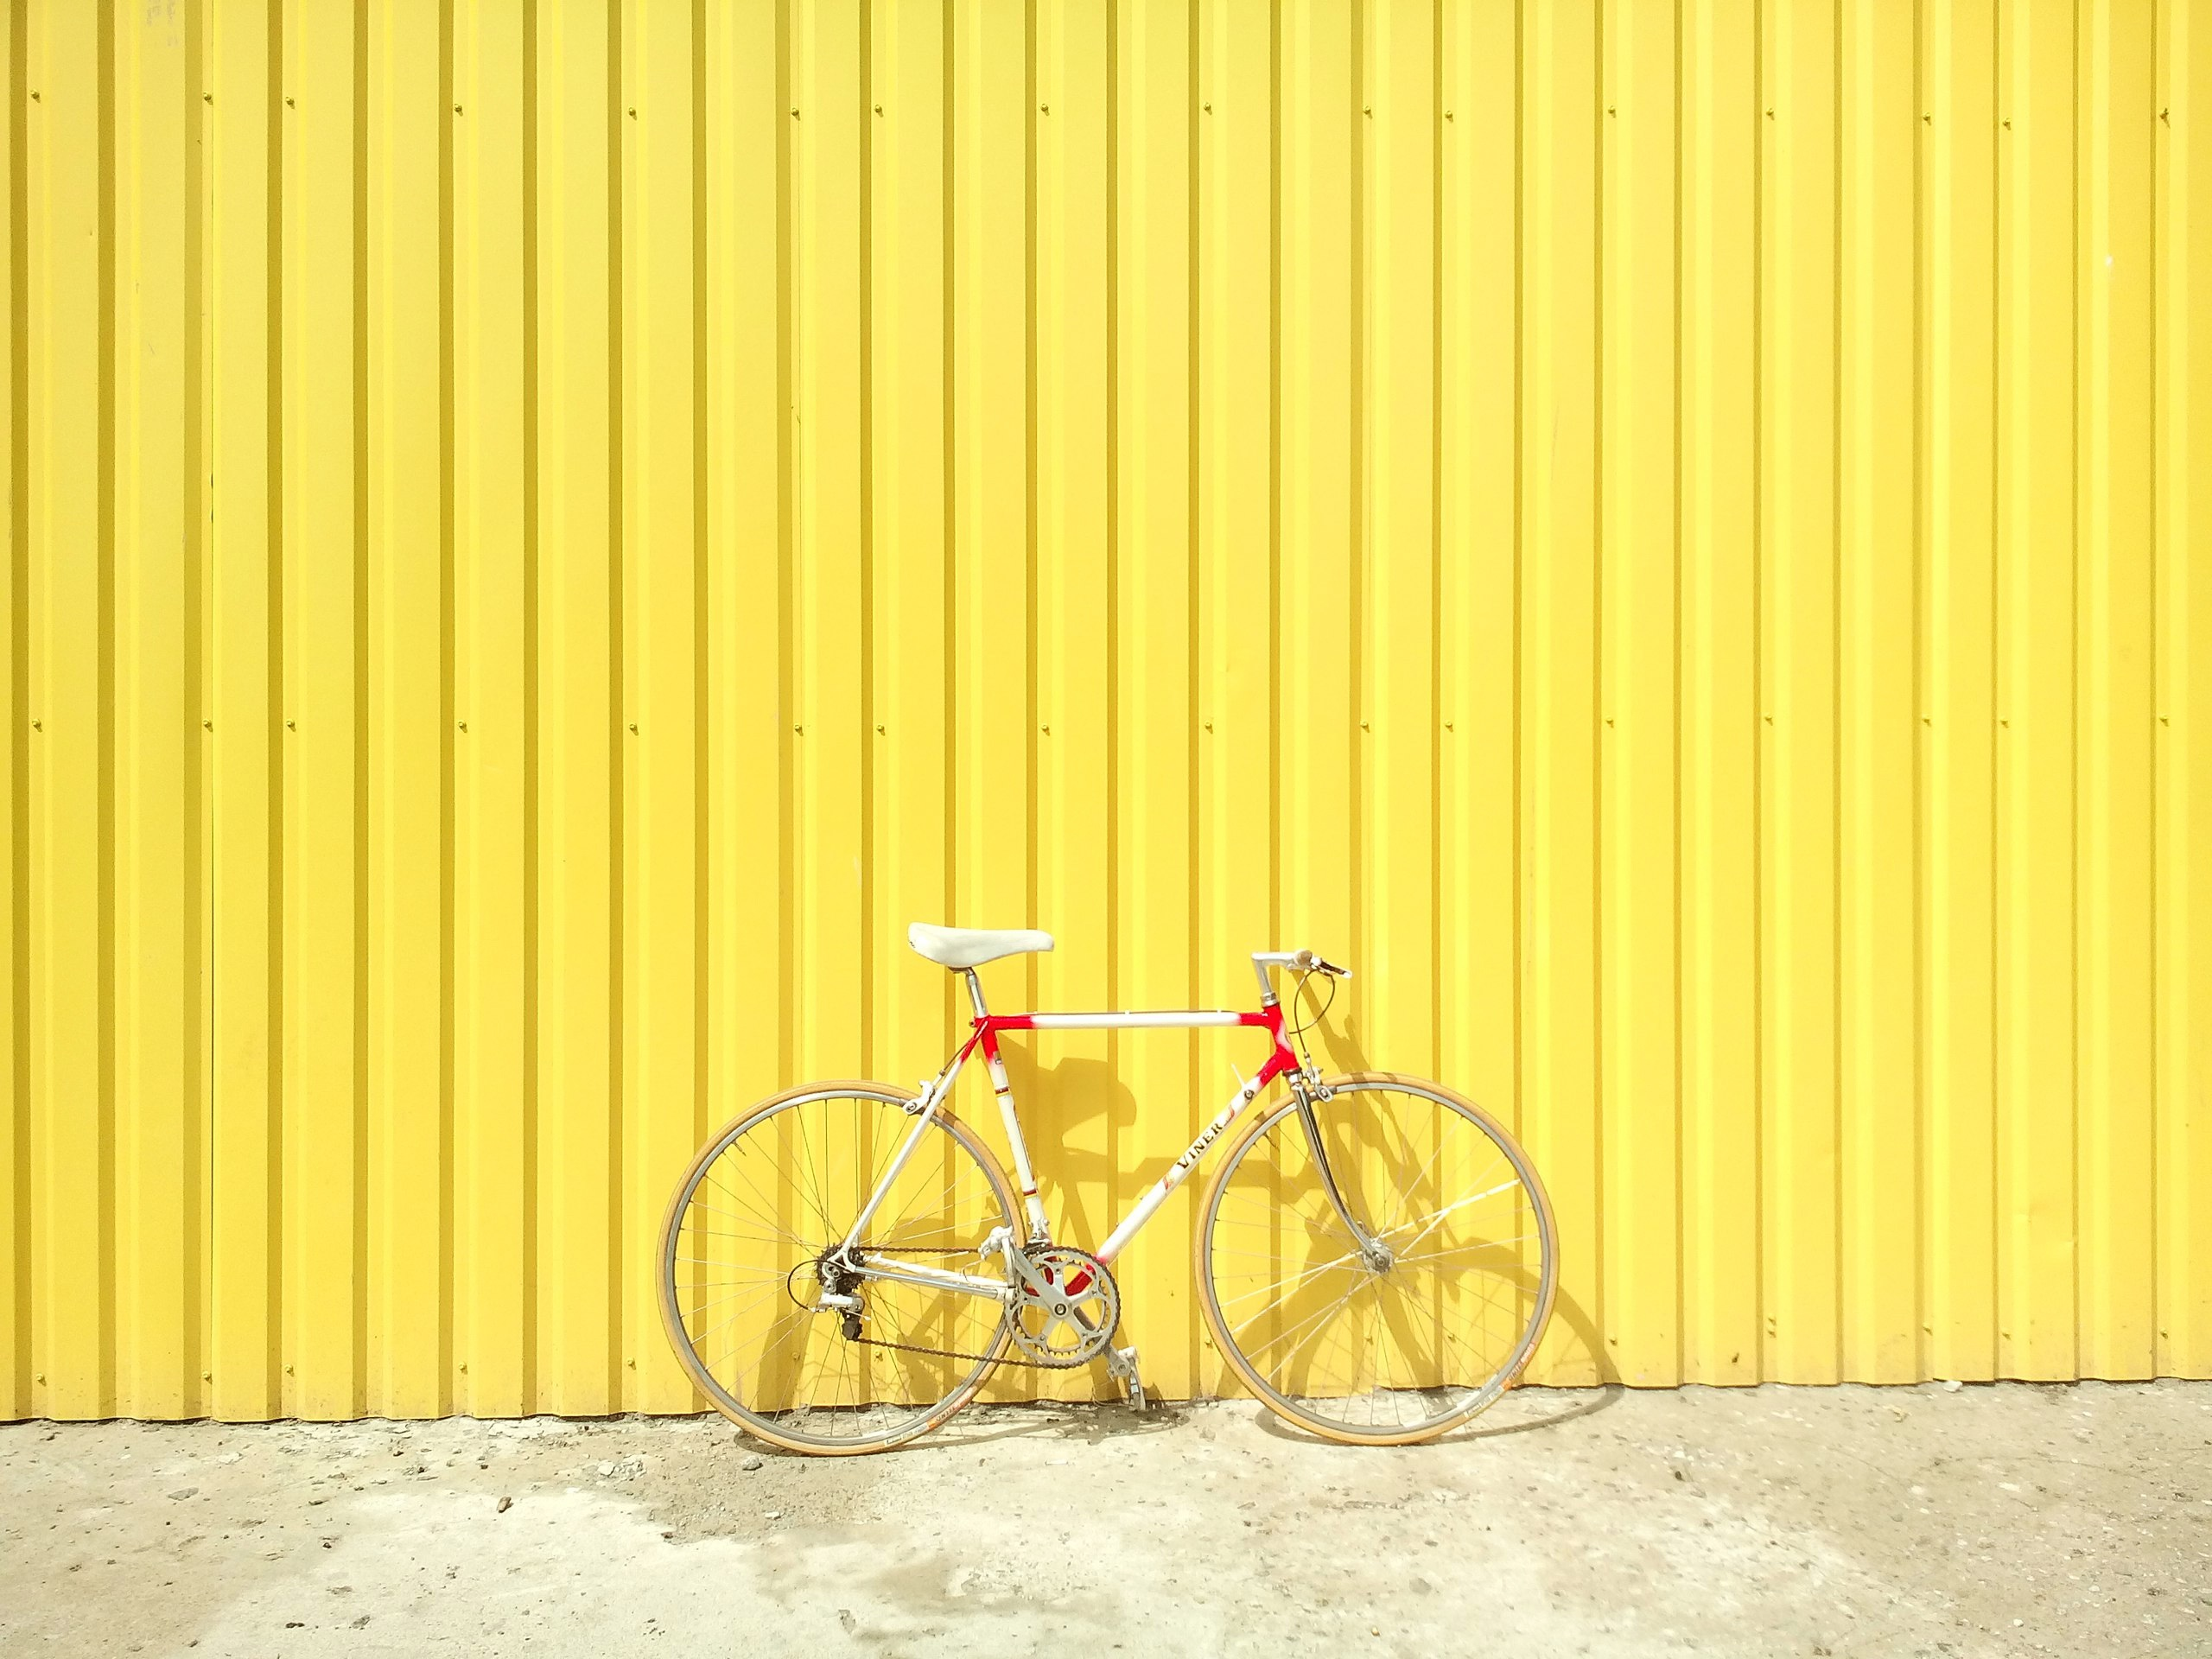 Click, Bike, Cycle, Wheel, Yellow, HQ Photo